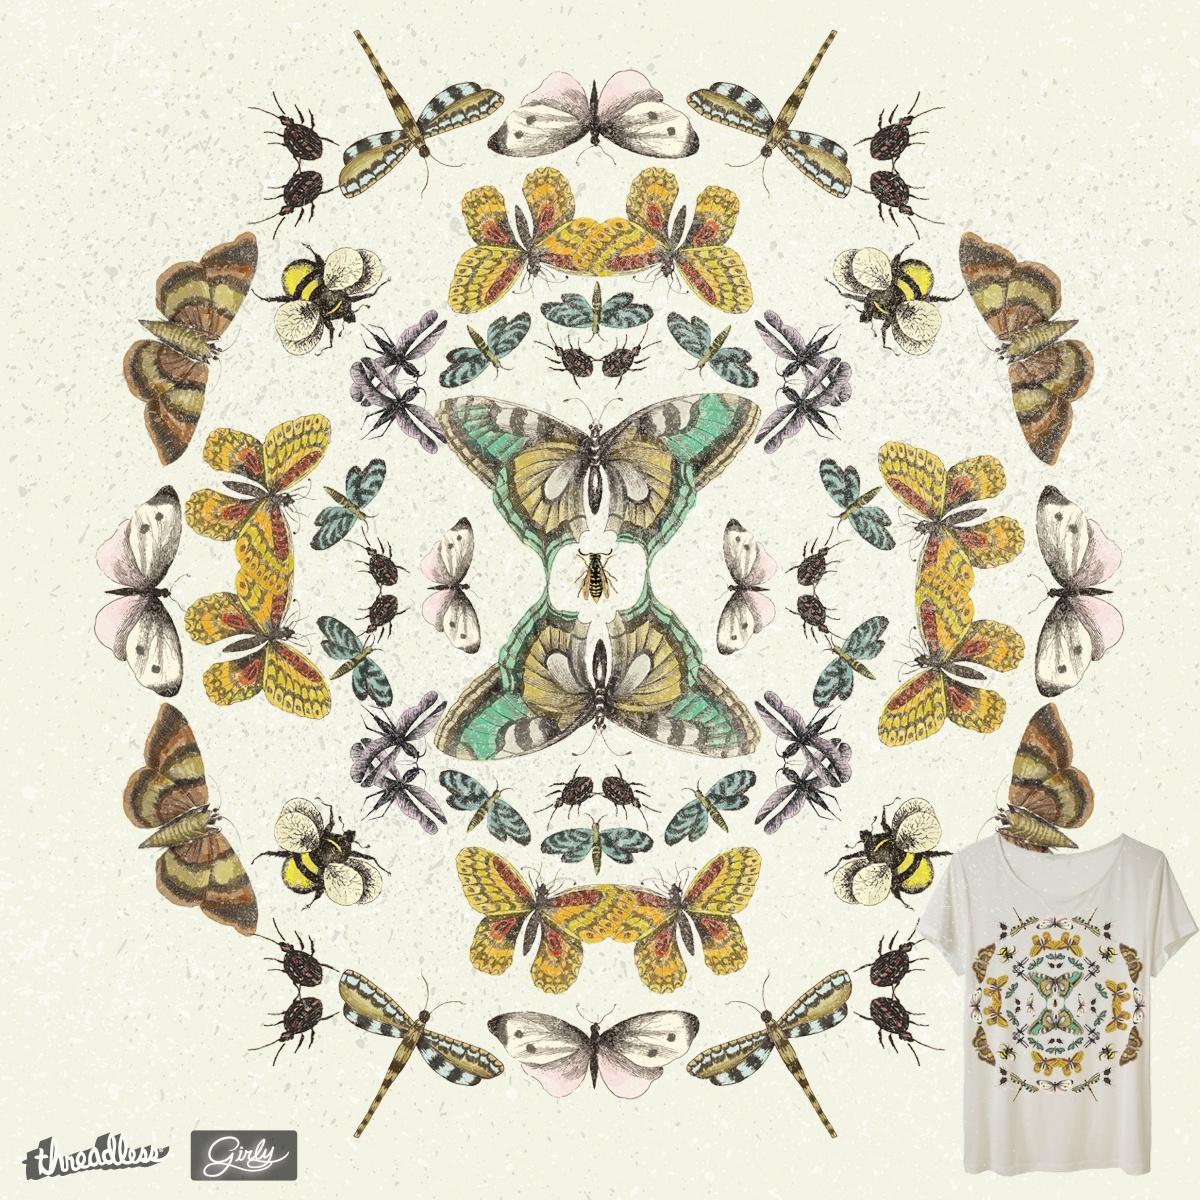 mandala bugs by amaara on Threadless